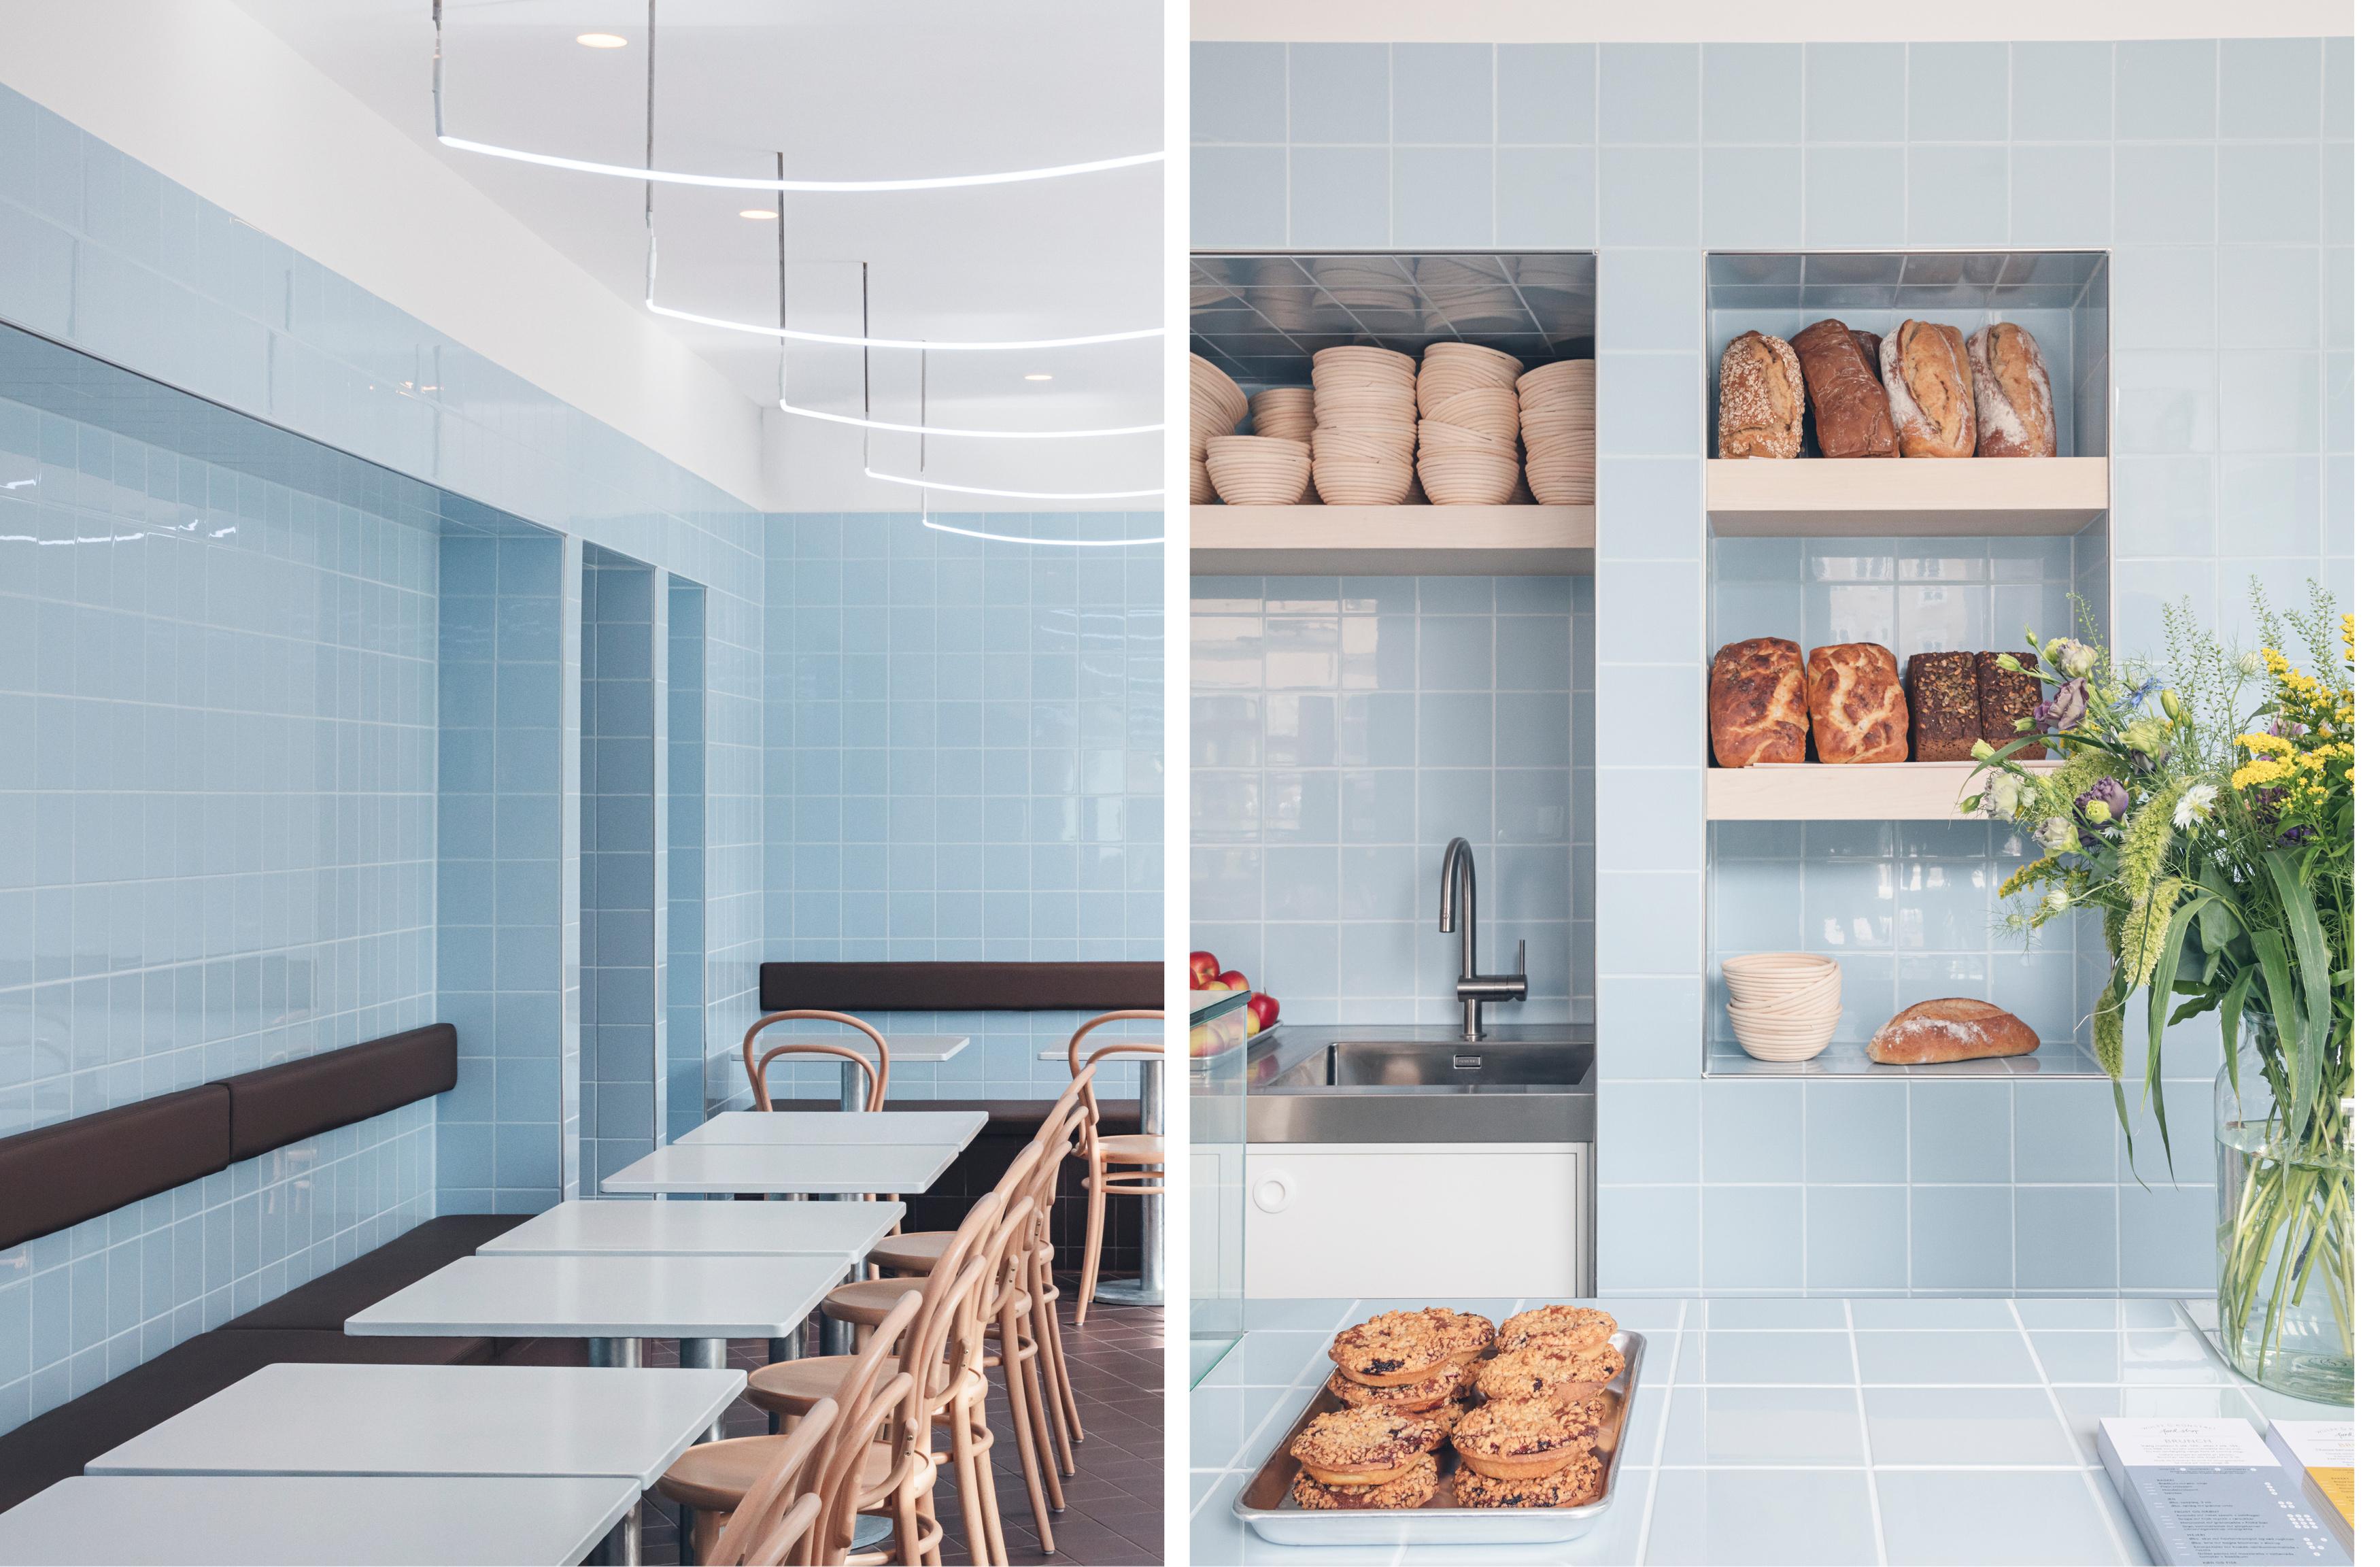 Wulff and Konstali Food Shop - Studio David Thulstrup